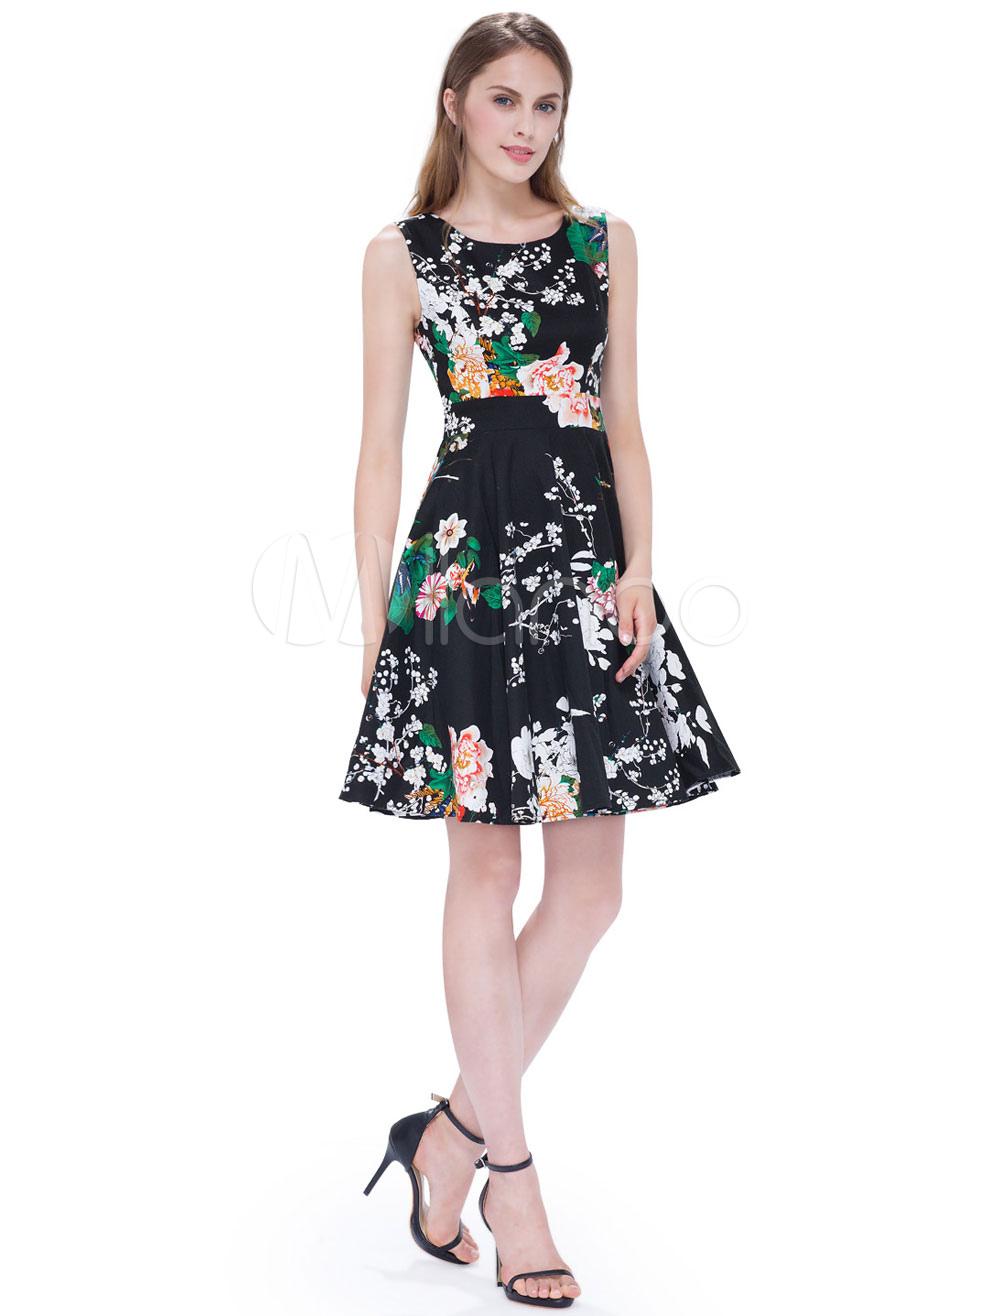 Short Homecoming Dresses Floral Print Prom Dress A Line Elastic Silk Mini Party Dress (Wedding) photo